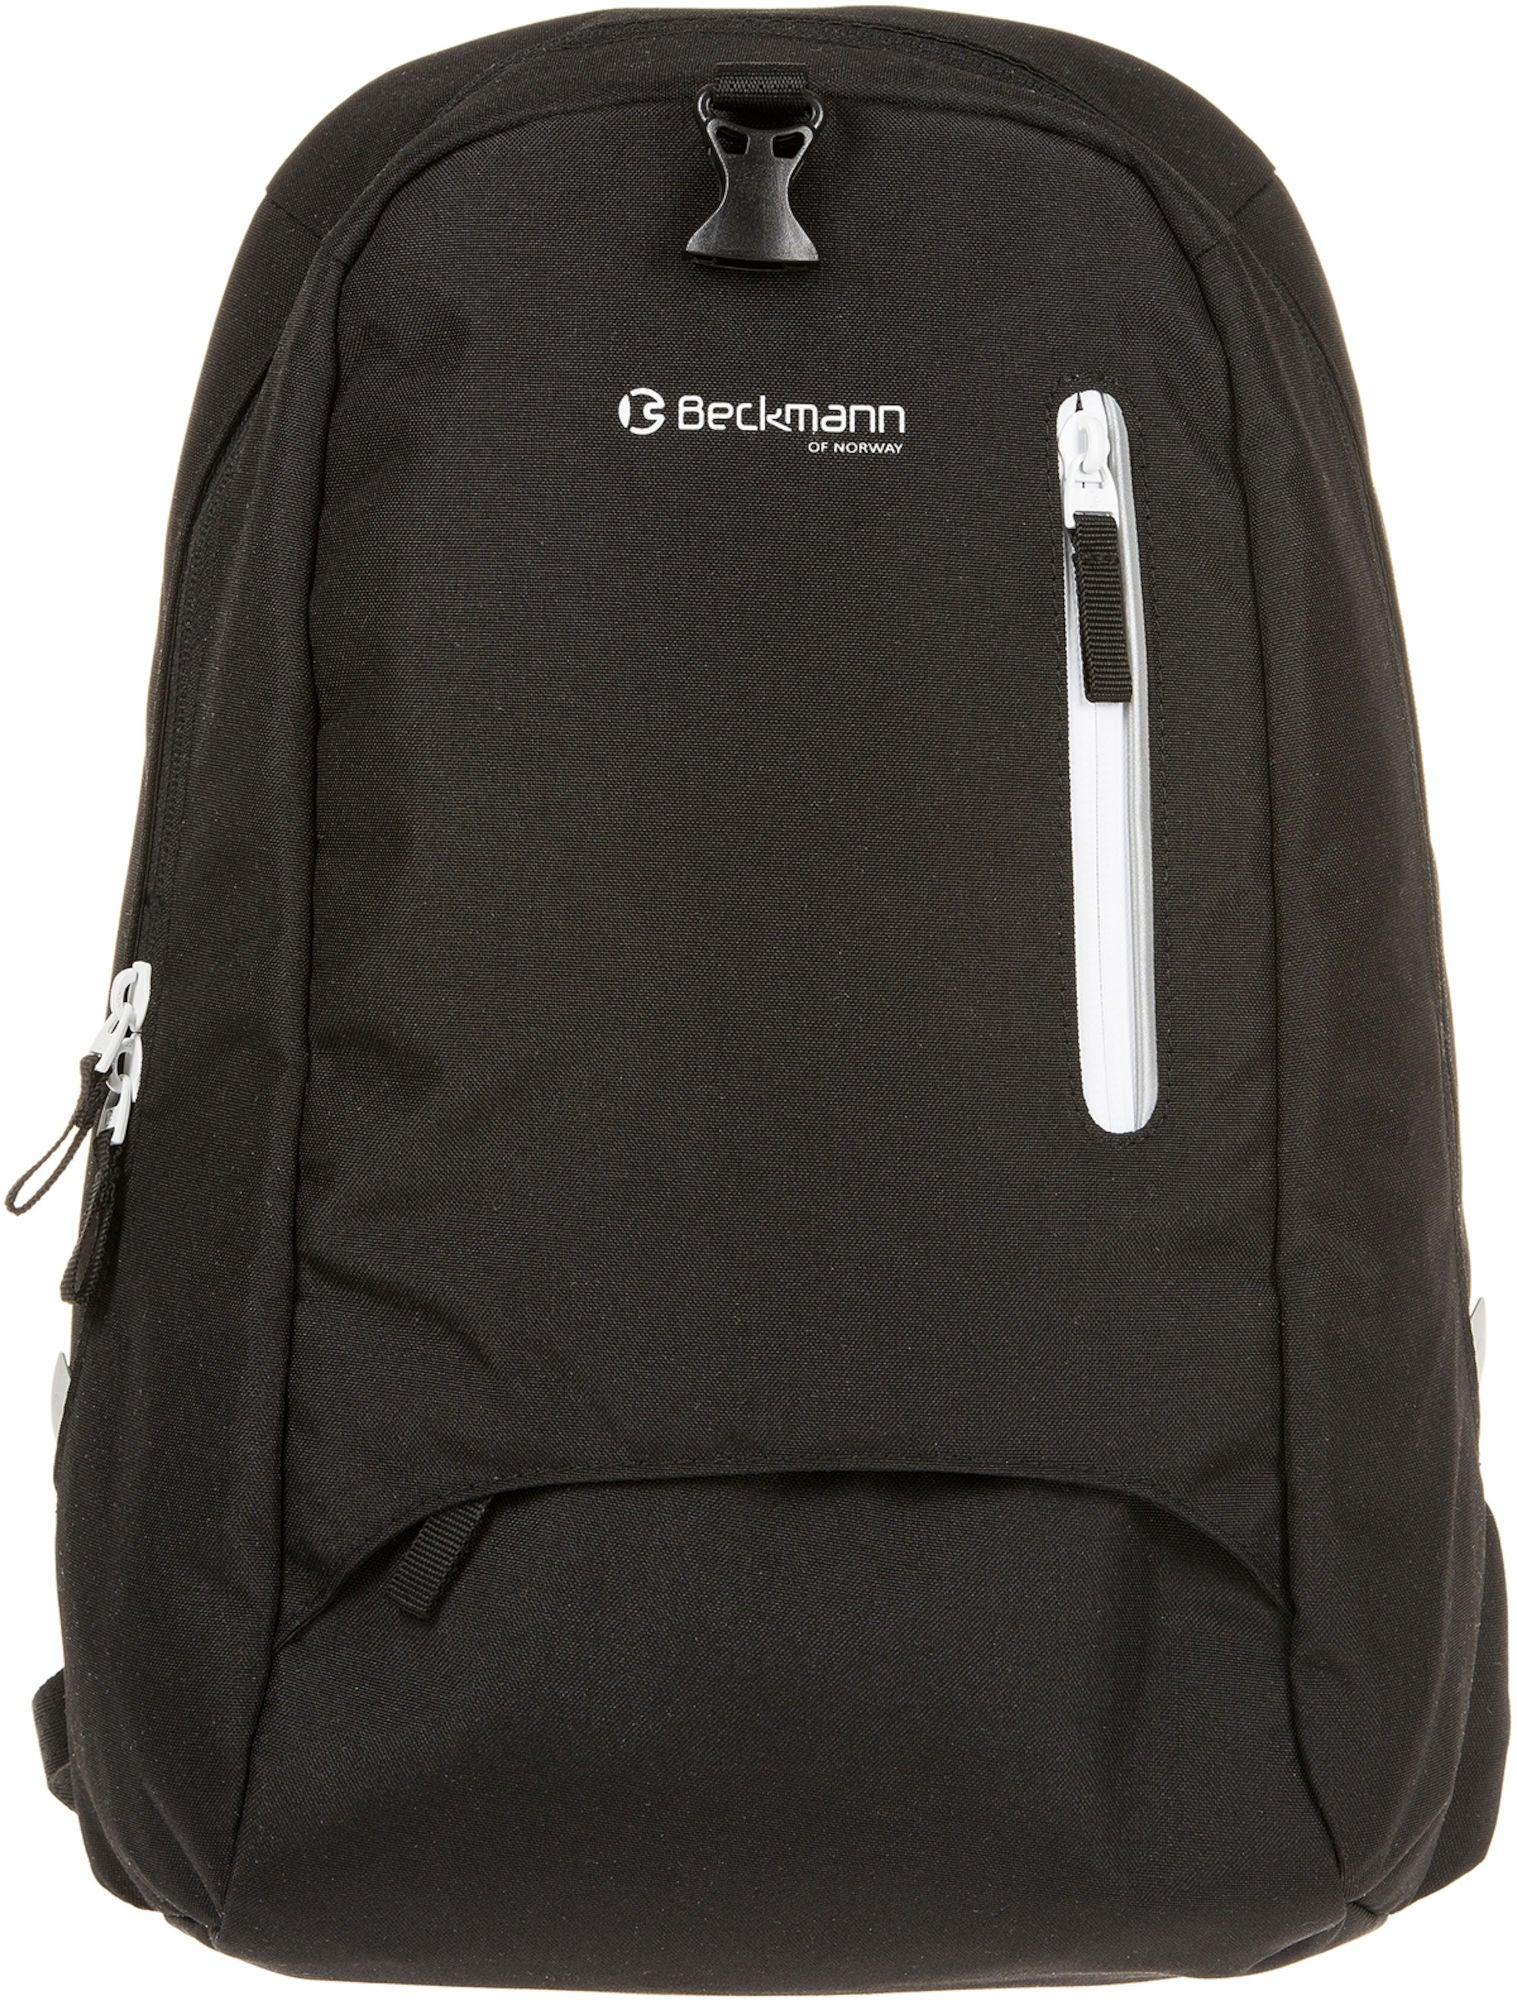 Kjøp Beckmann Ryggsekk 16 L, Black   Jollyroom